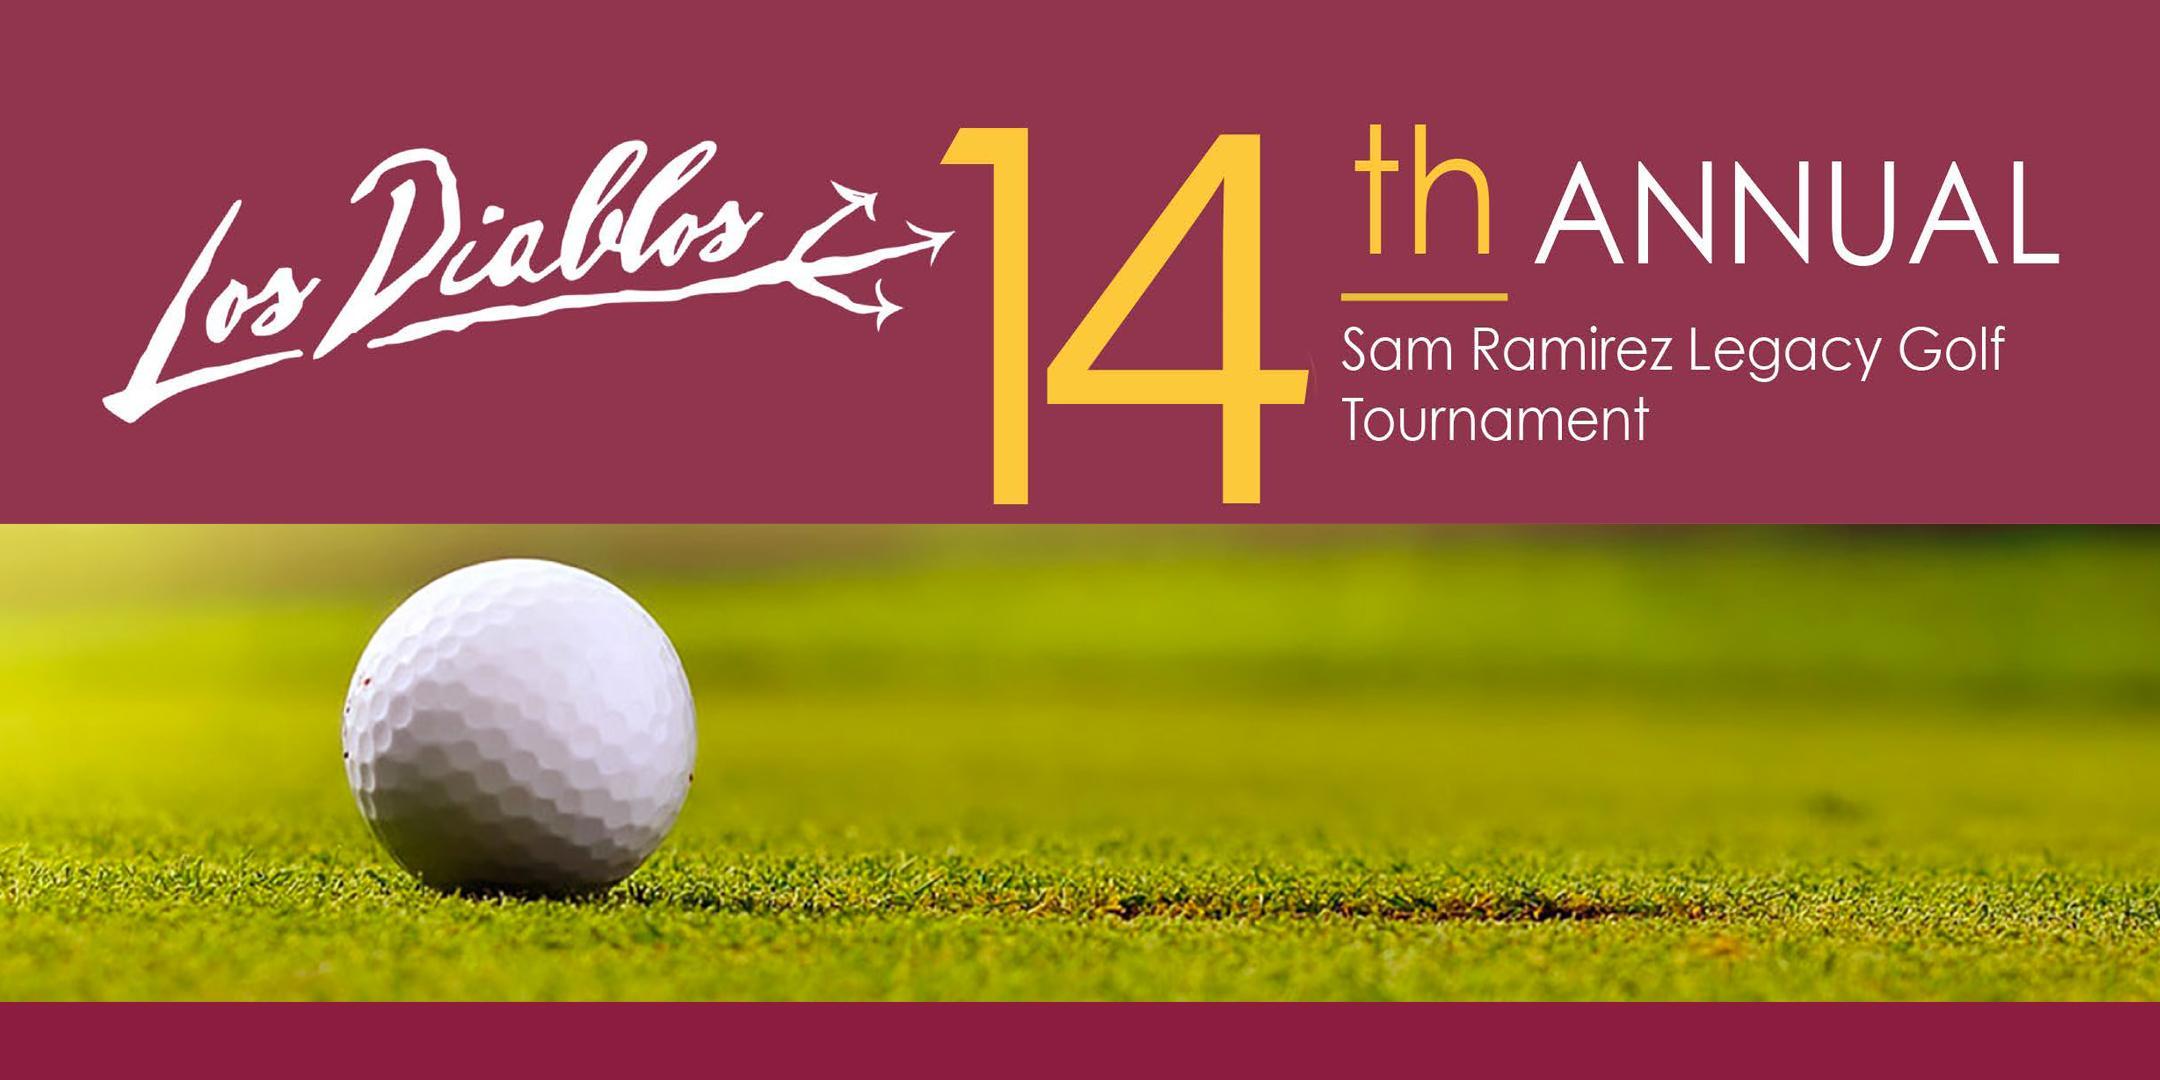 Los Diablos 14th Annual Sam Ramirez Legacy Golf Tournament